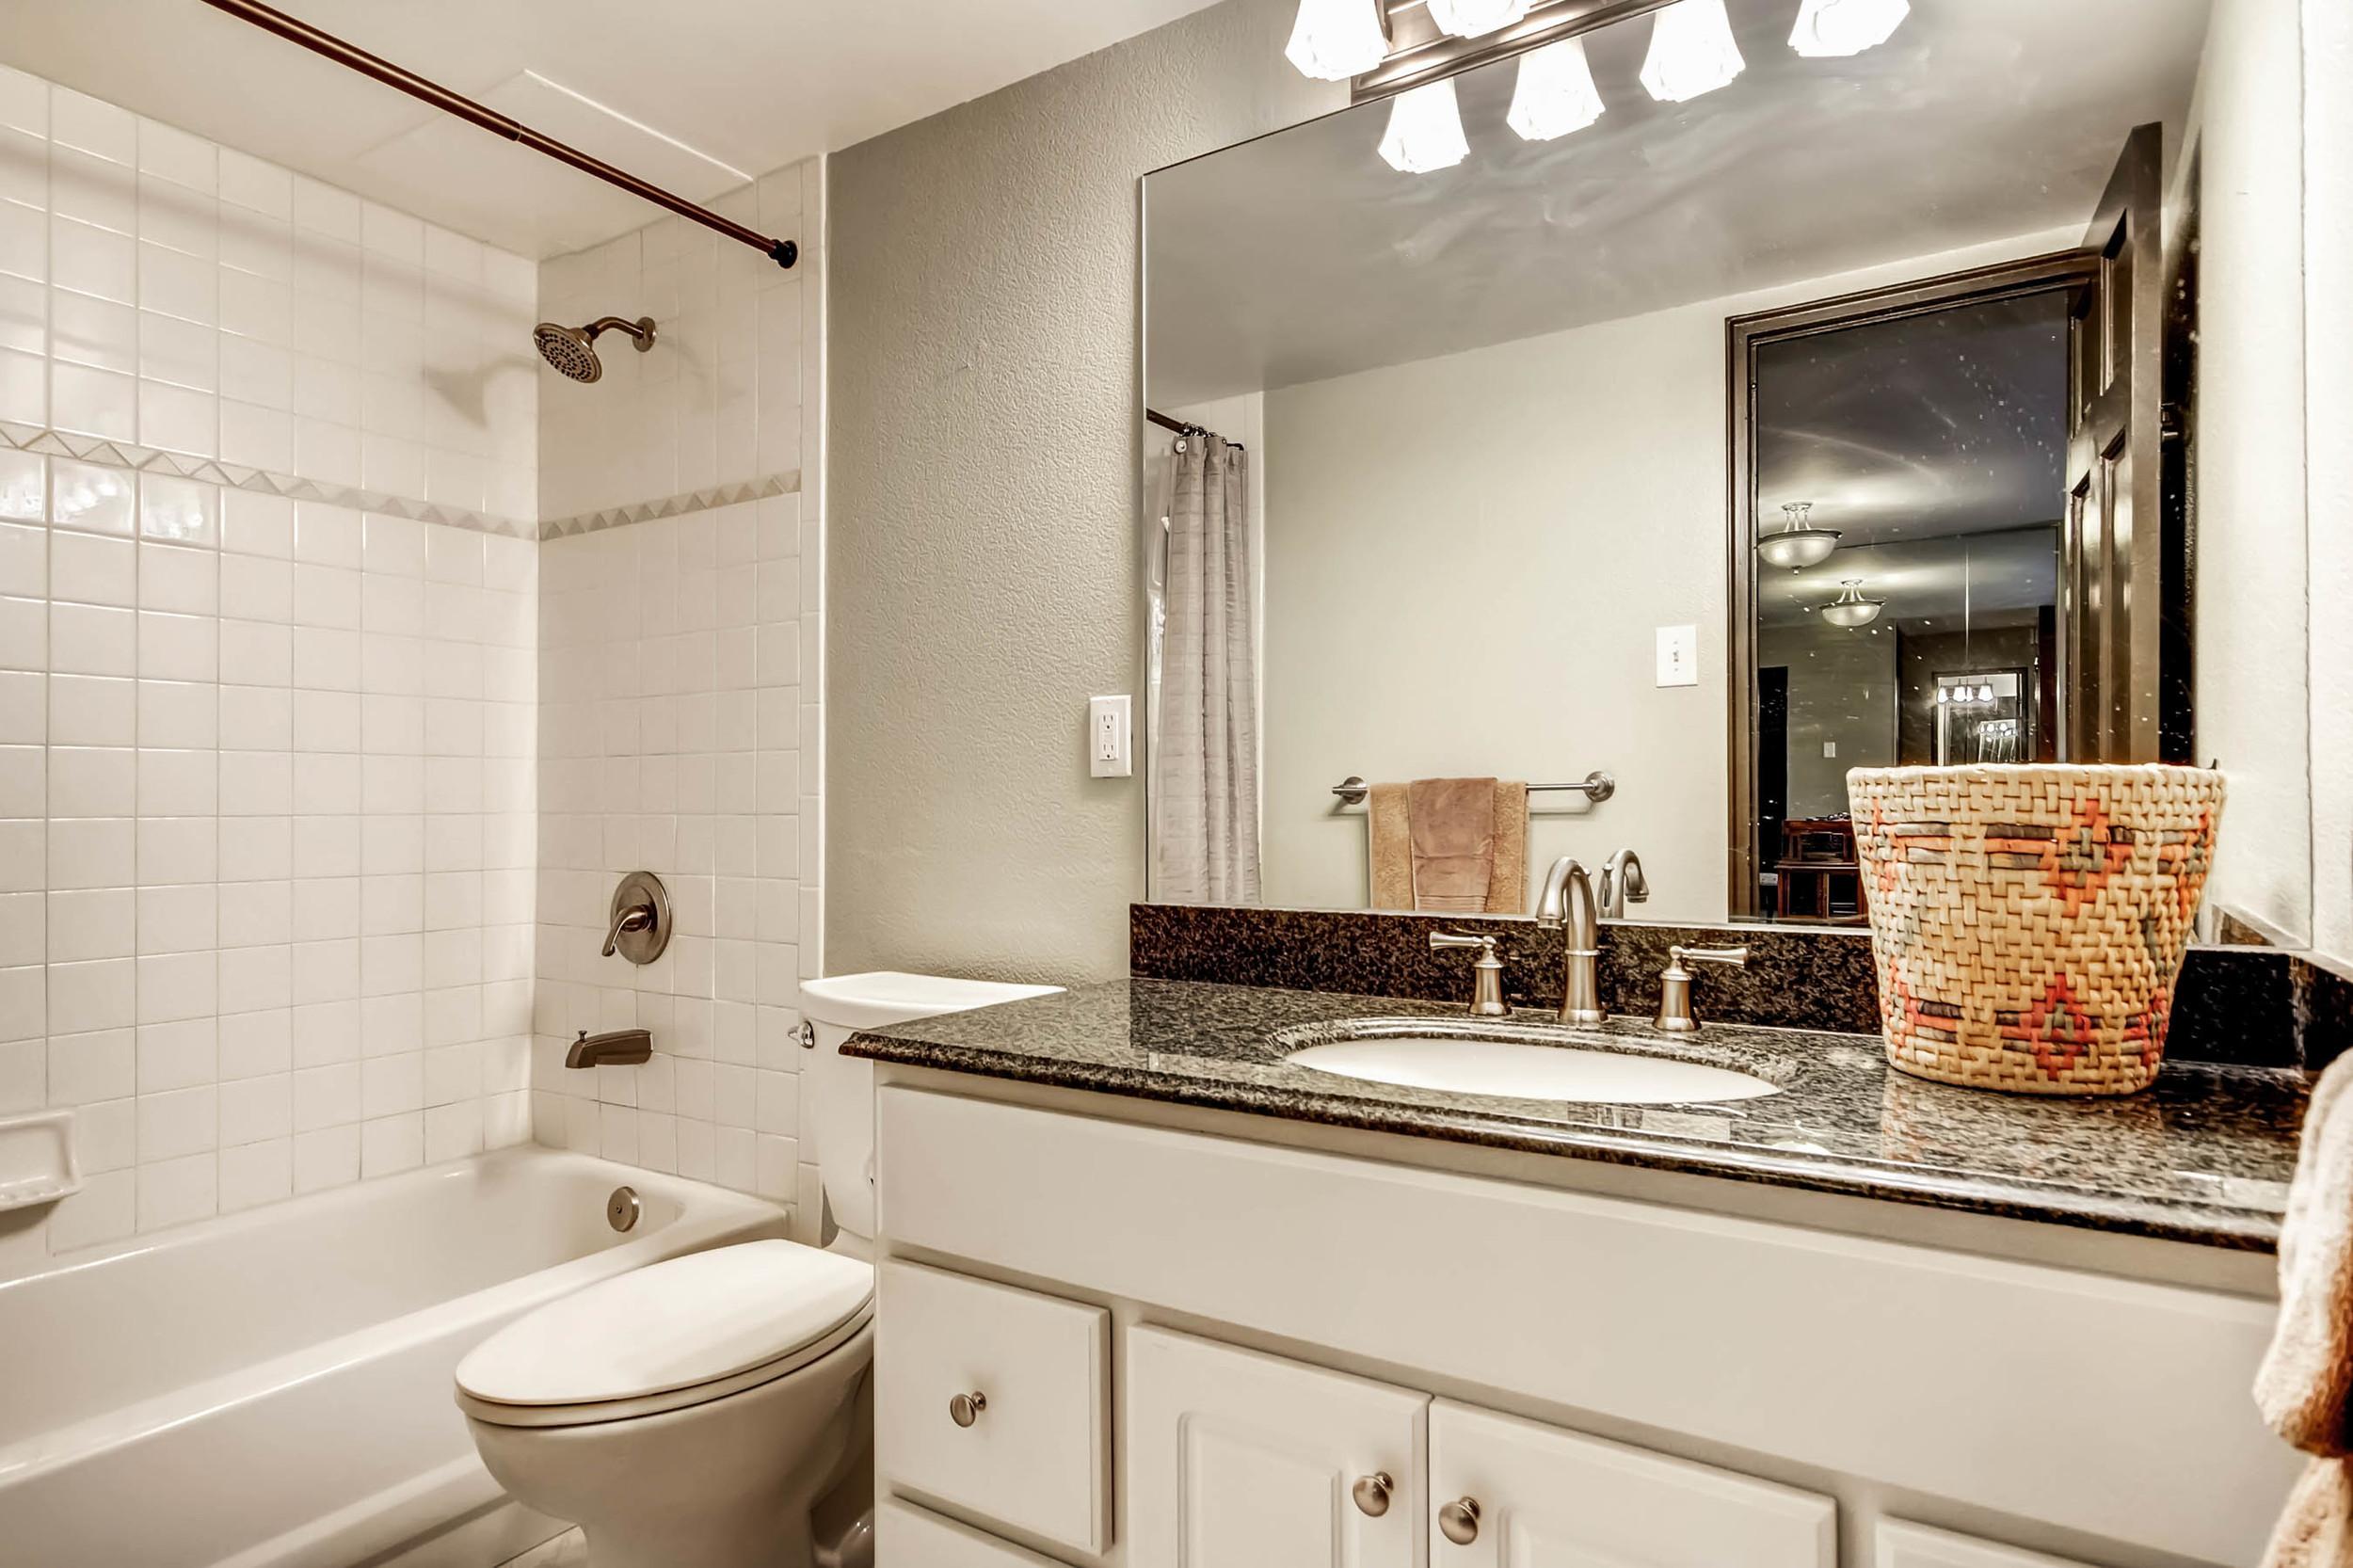 800 Washington St Unit 706-print-016-26-Master Bathroom-2700x1799-300dpi.jpg